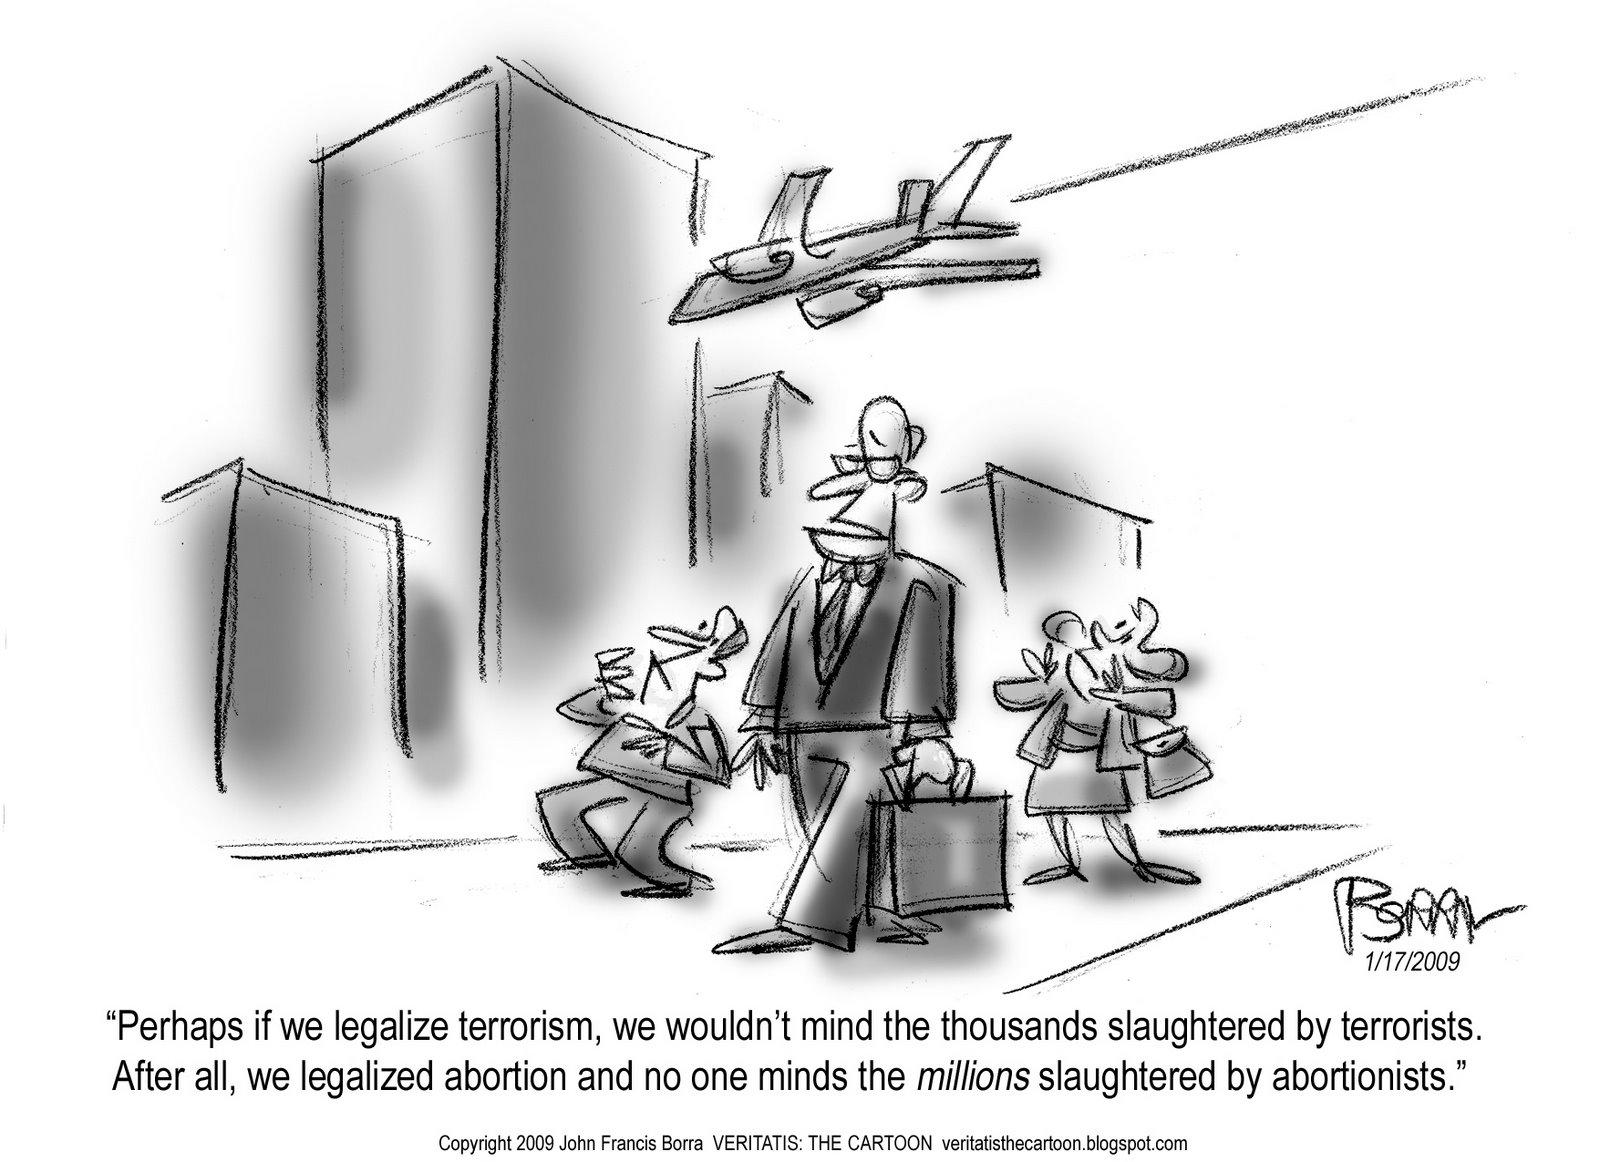 [Legalize+Terrorism+HT+1.jpg]